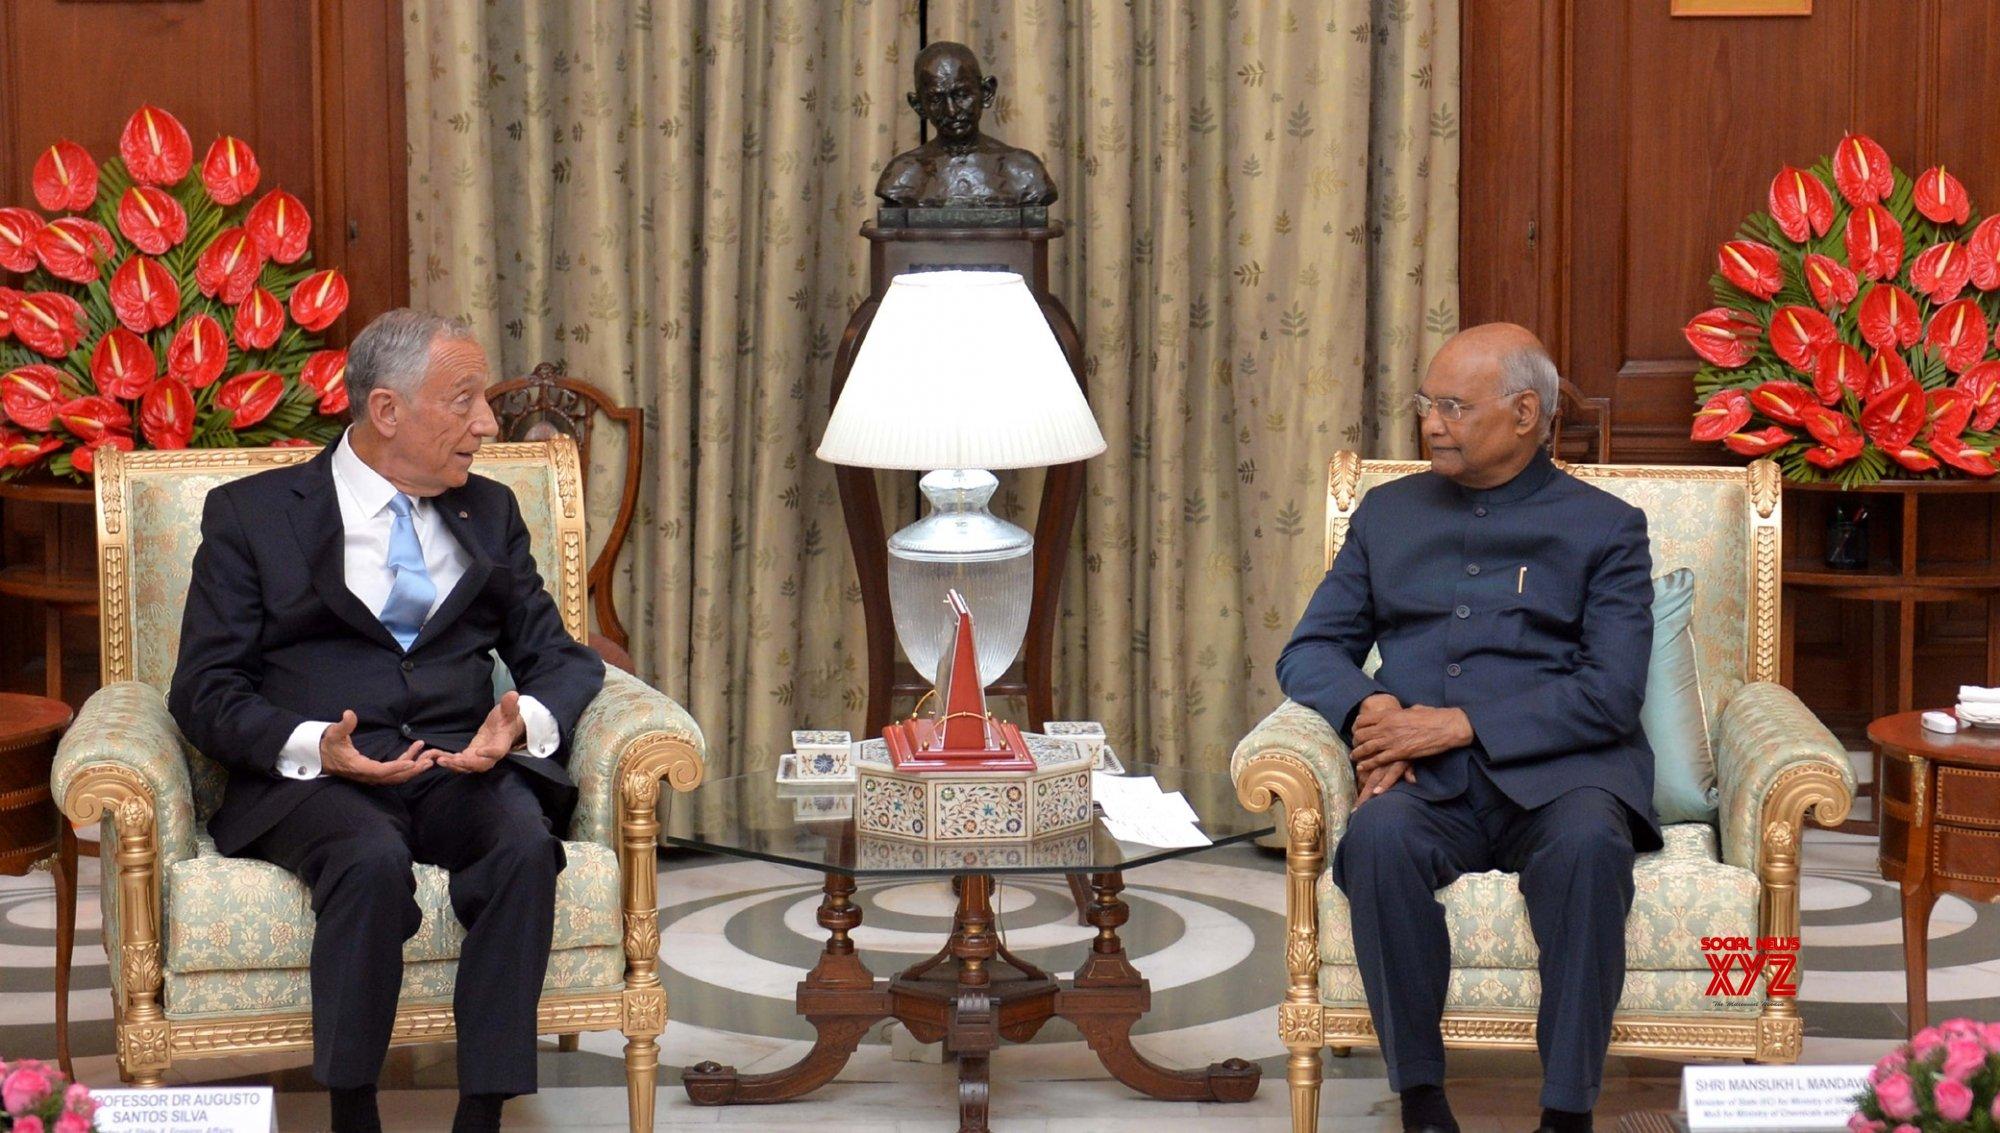 New Delhi: Portuguese President meets Kovind #Gallery